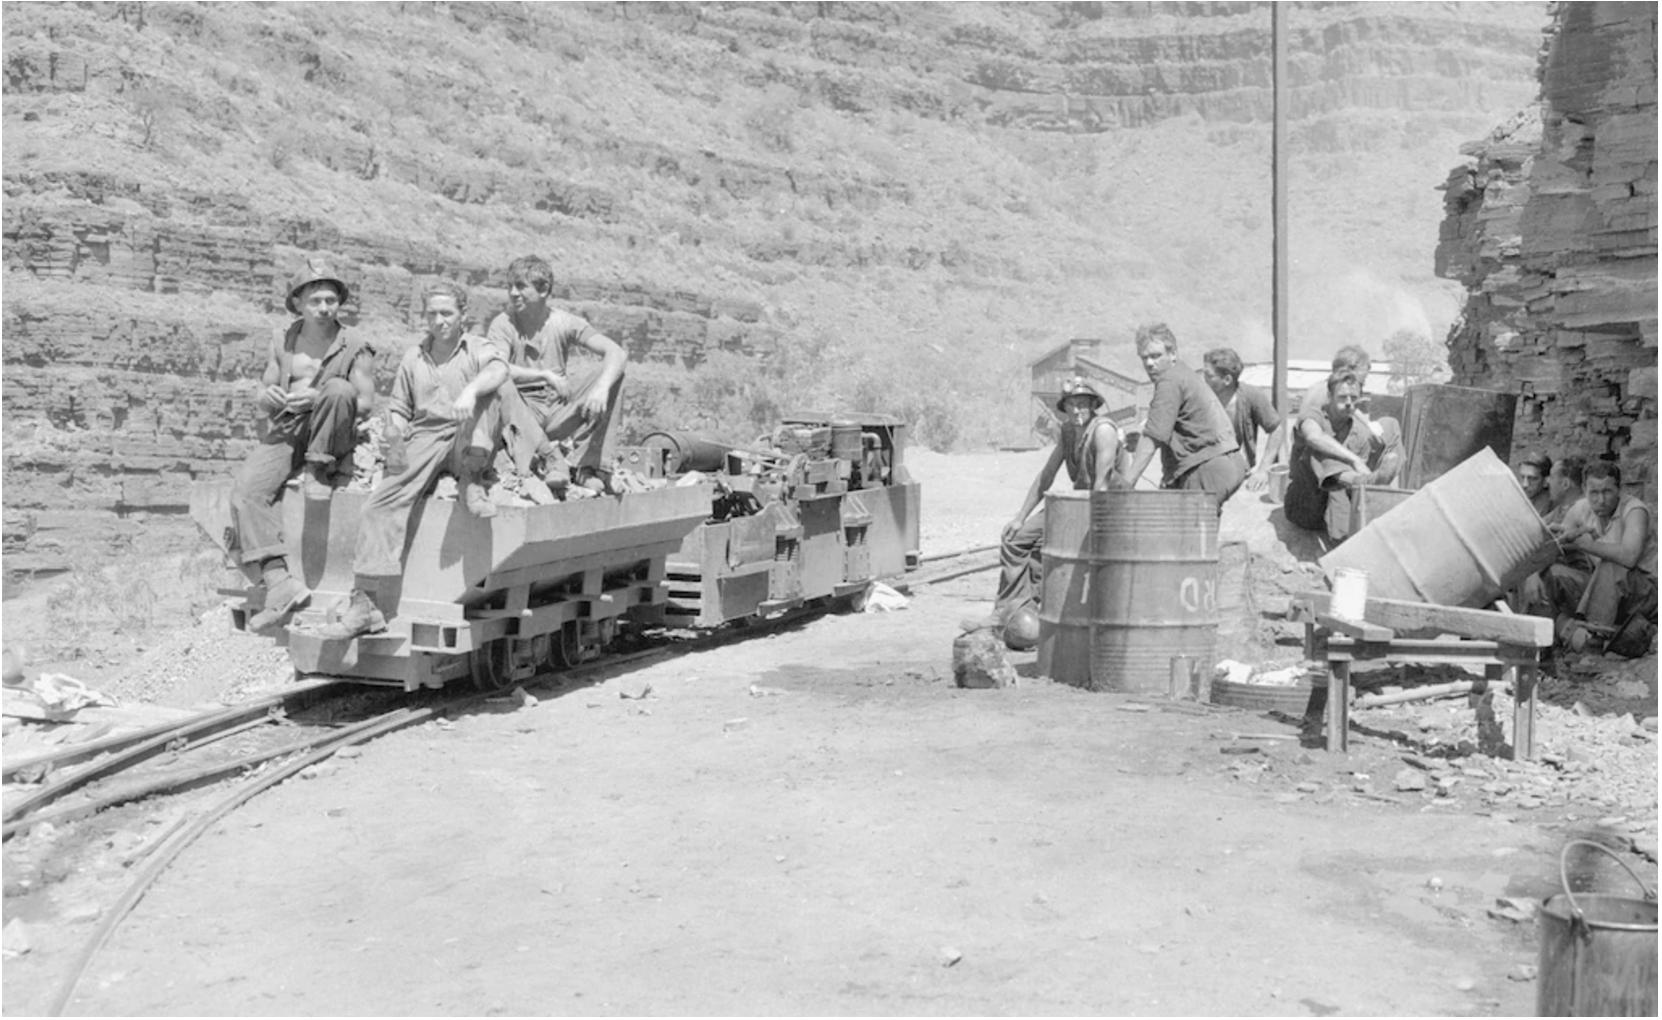 Australian asbestos miners mining blue asbestos in Wittenoom gorge, circa 1950.